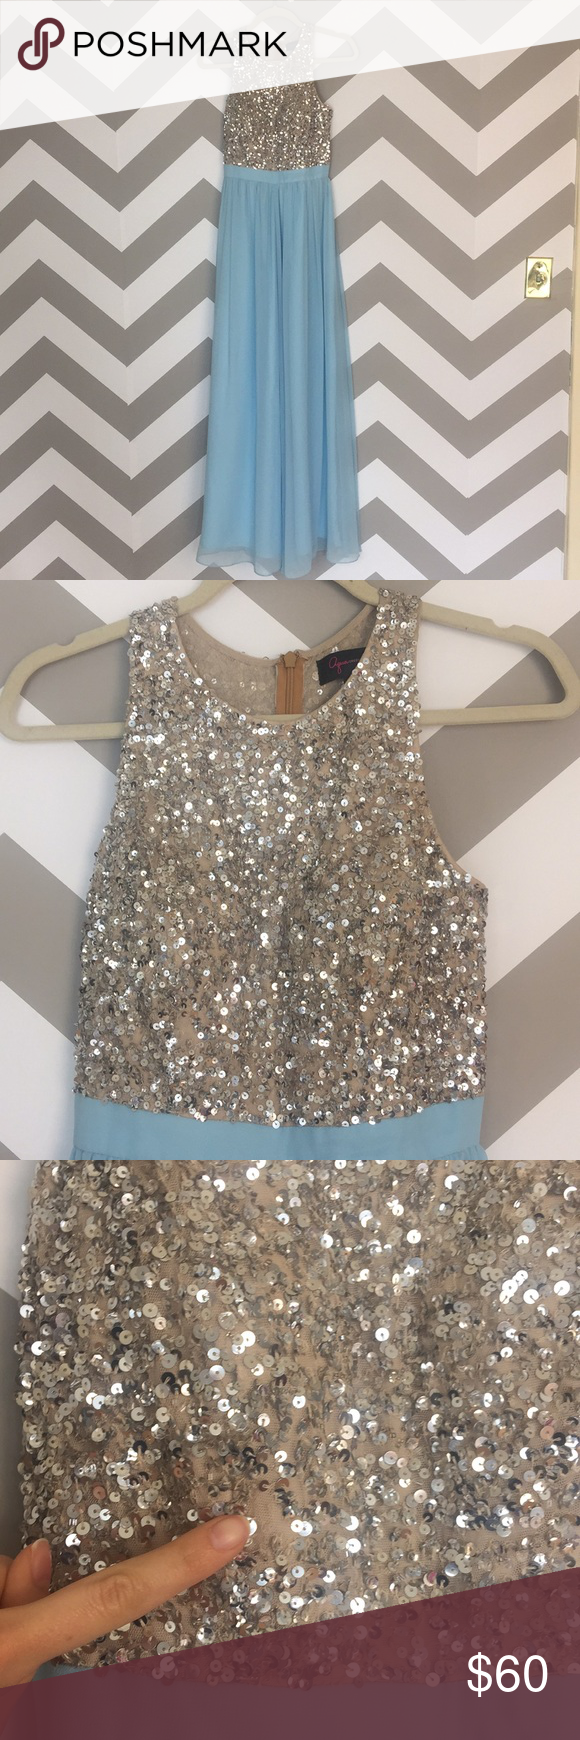 Aqua powder blue sequin chiffon prom gown my posh closet